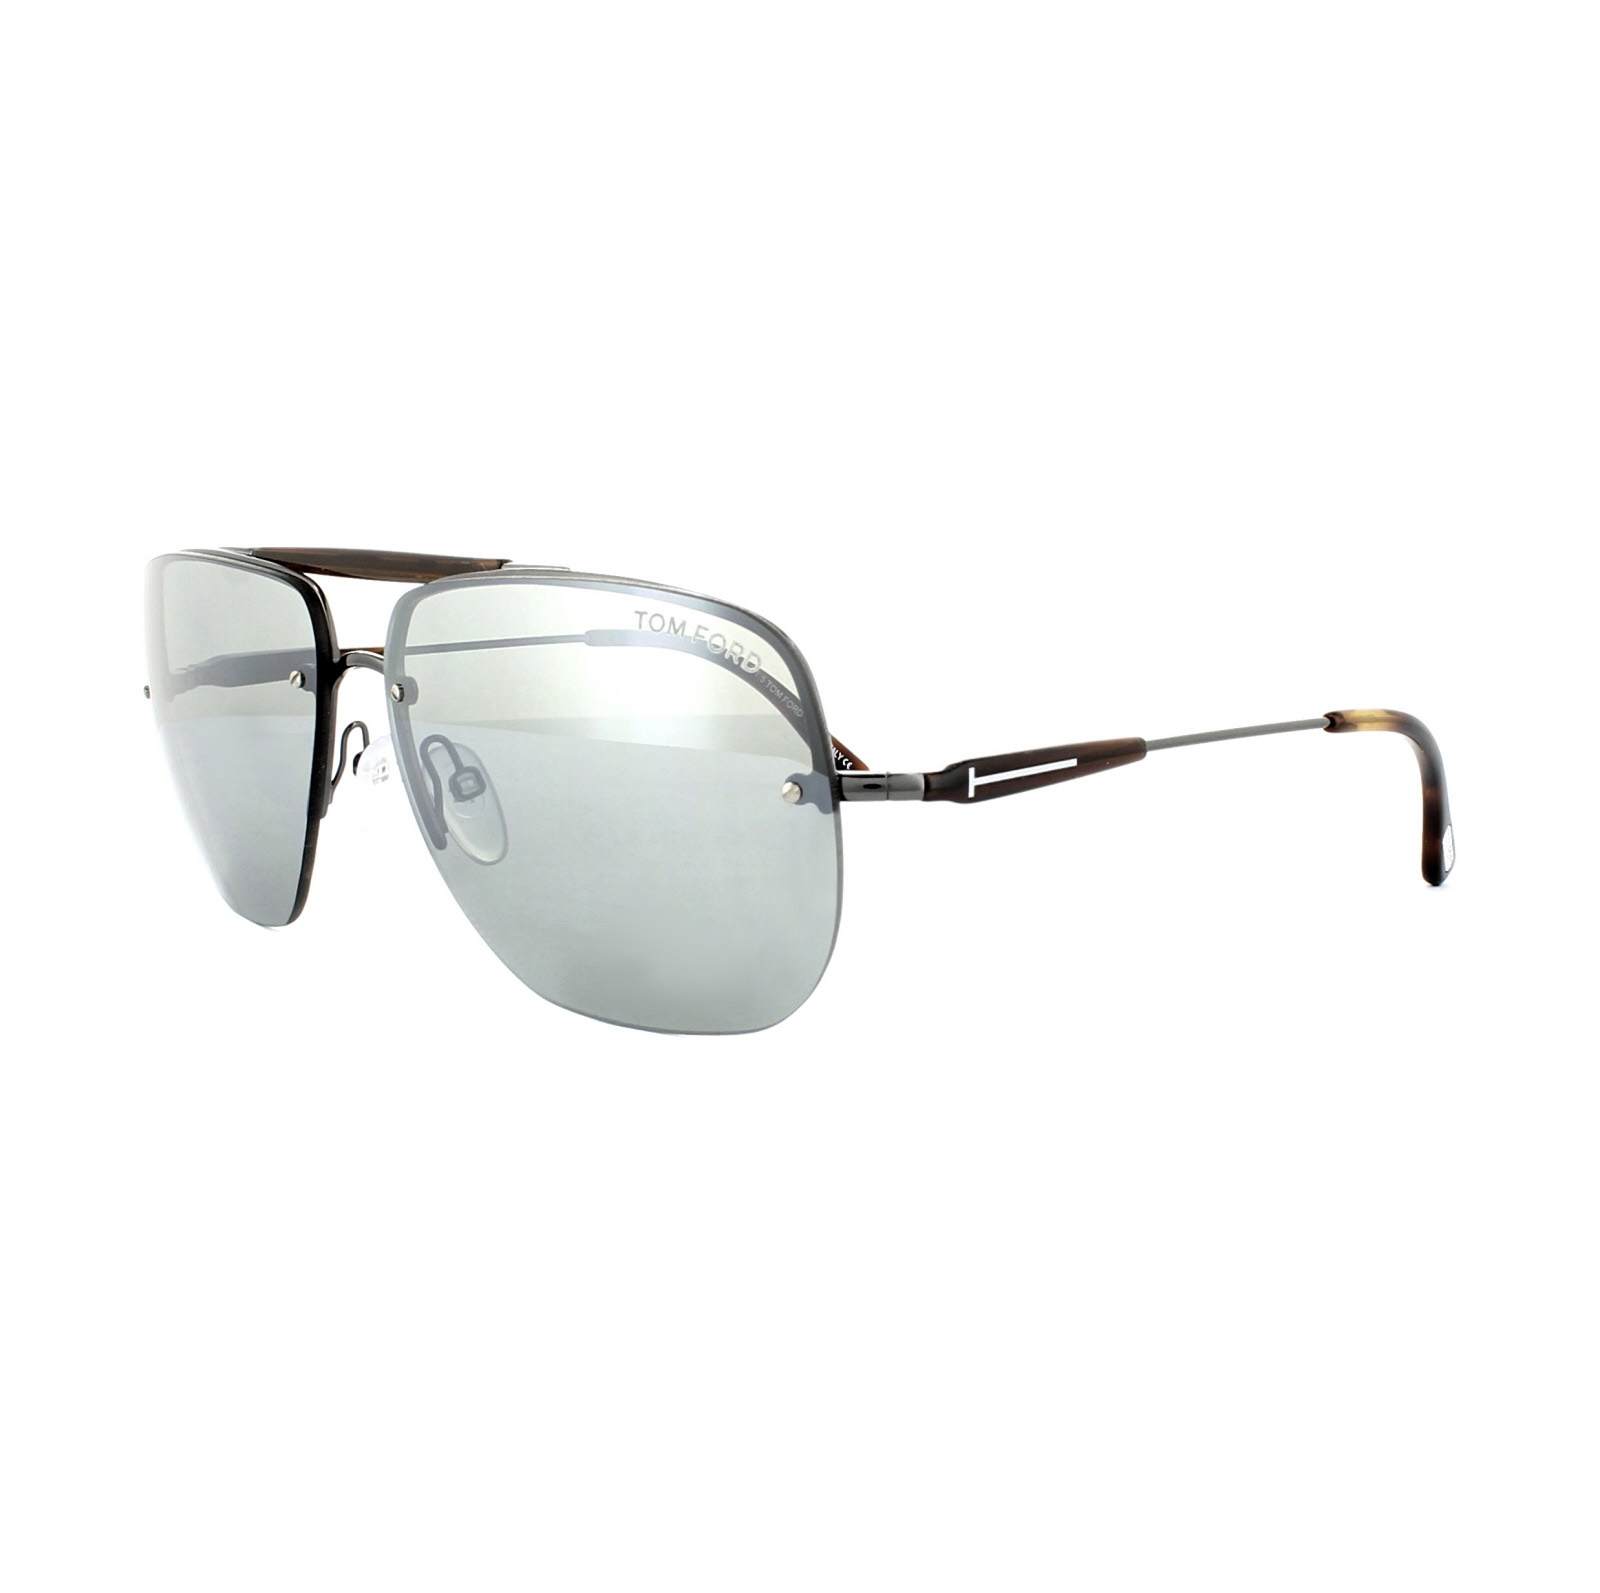 Tom Ford Mens Nils Semi Rimless Aviator Sunglasses in Matte Gunmetal Green Mirror FT0380 09Q 61